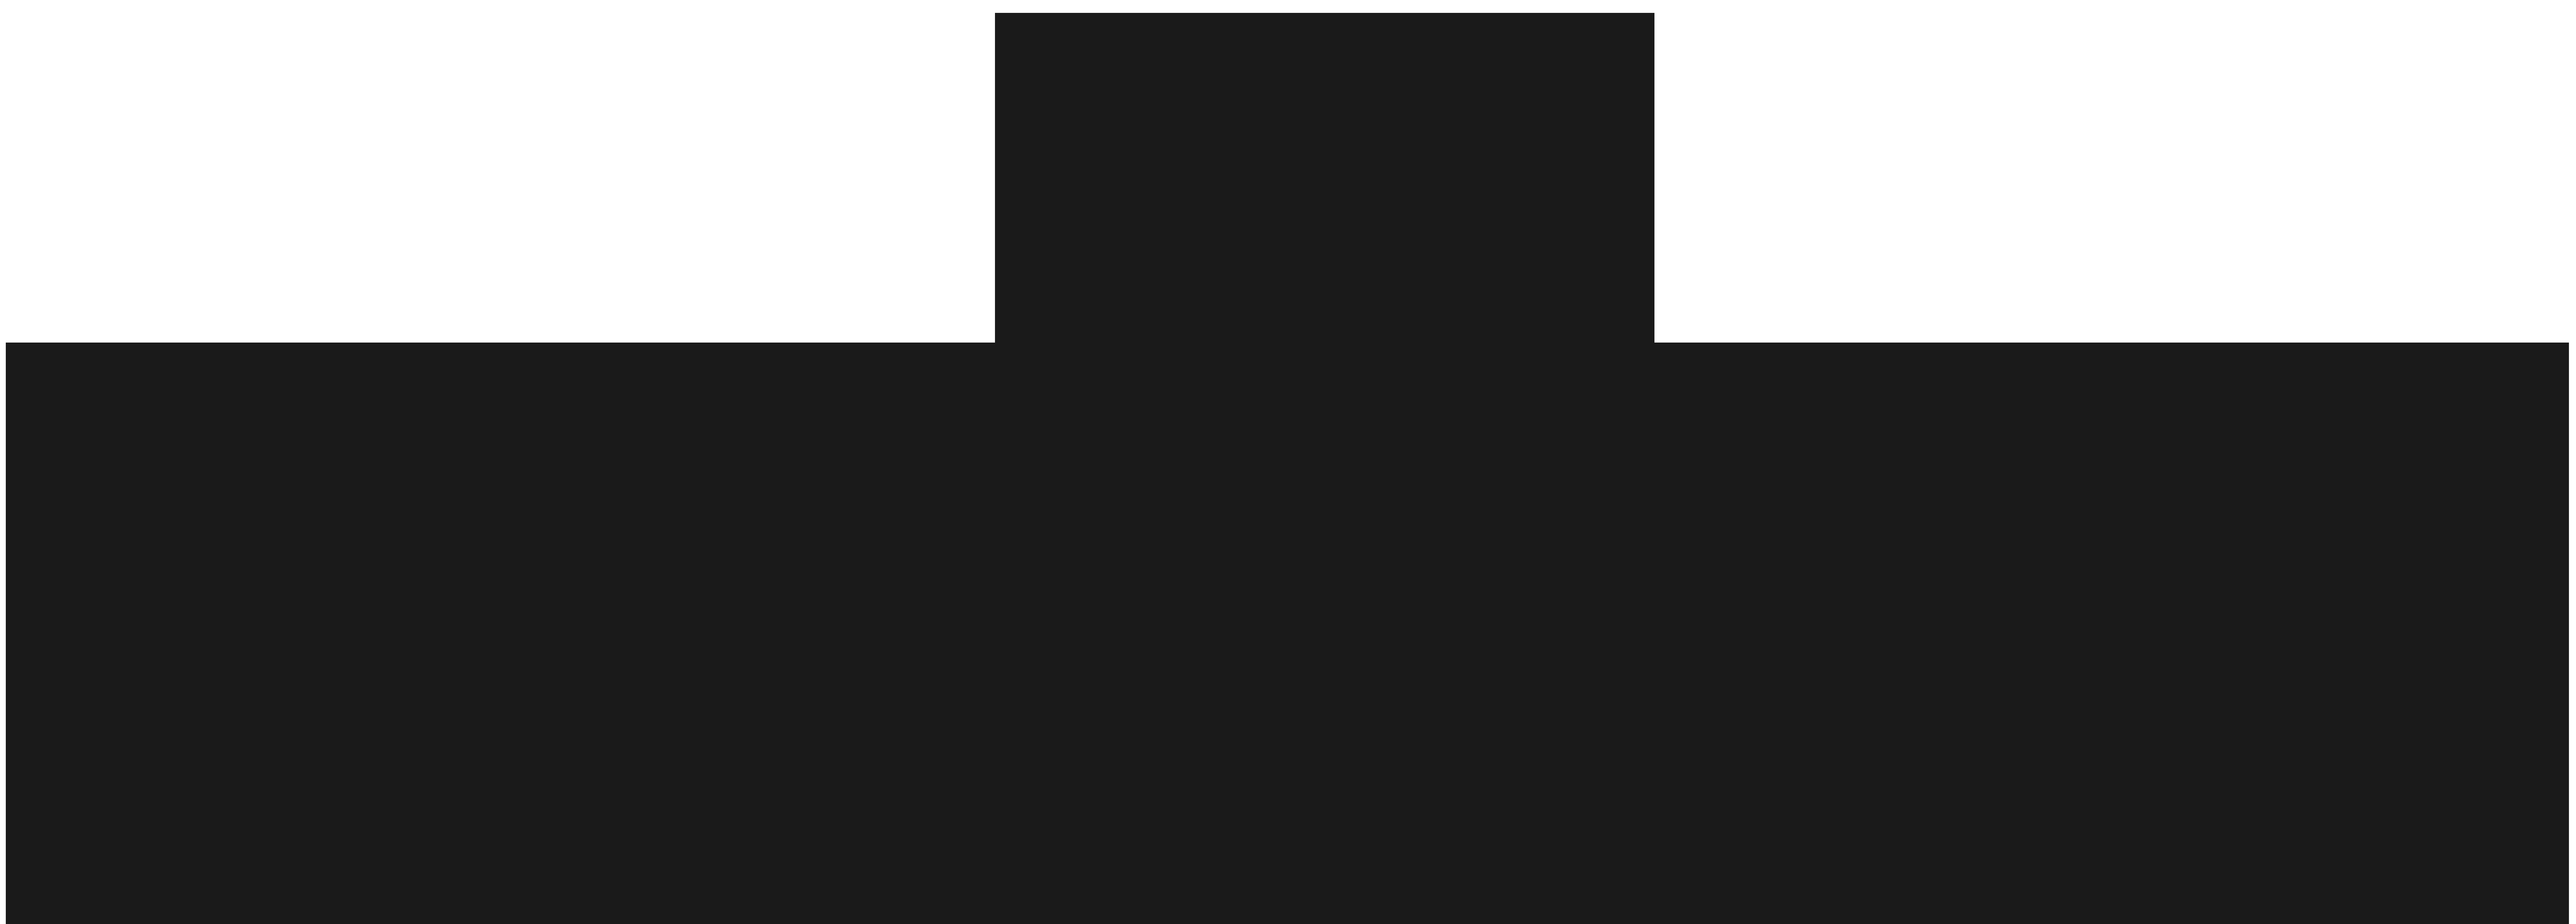 Skyline clipart border. New york building silhouette